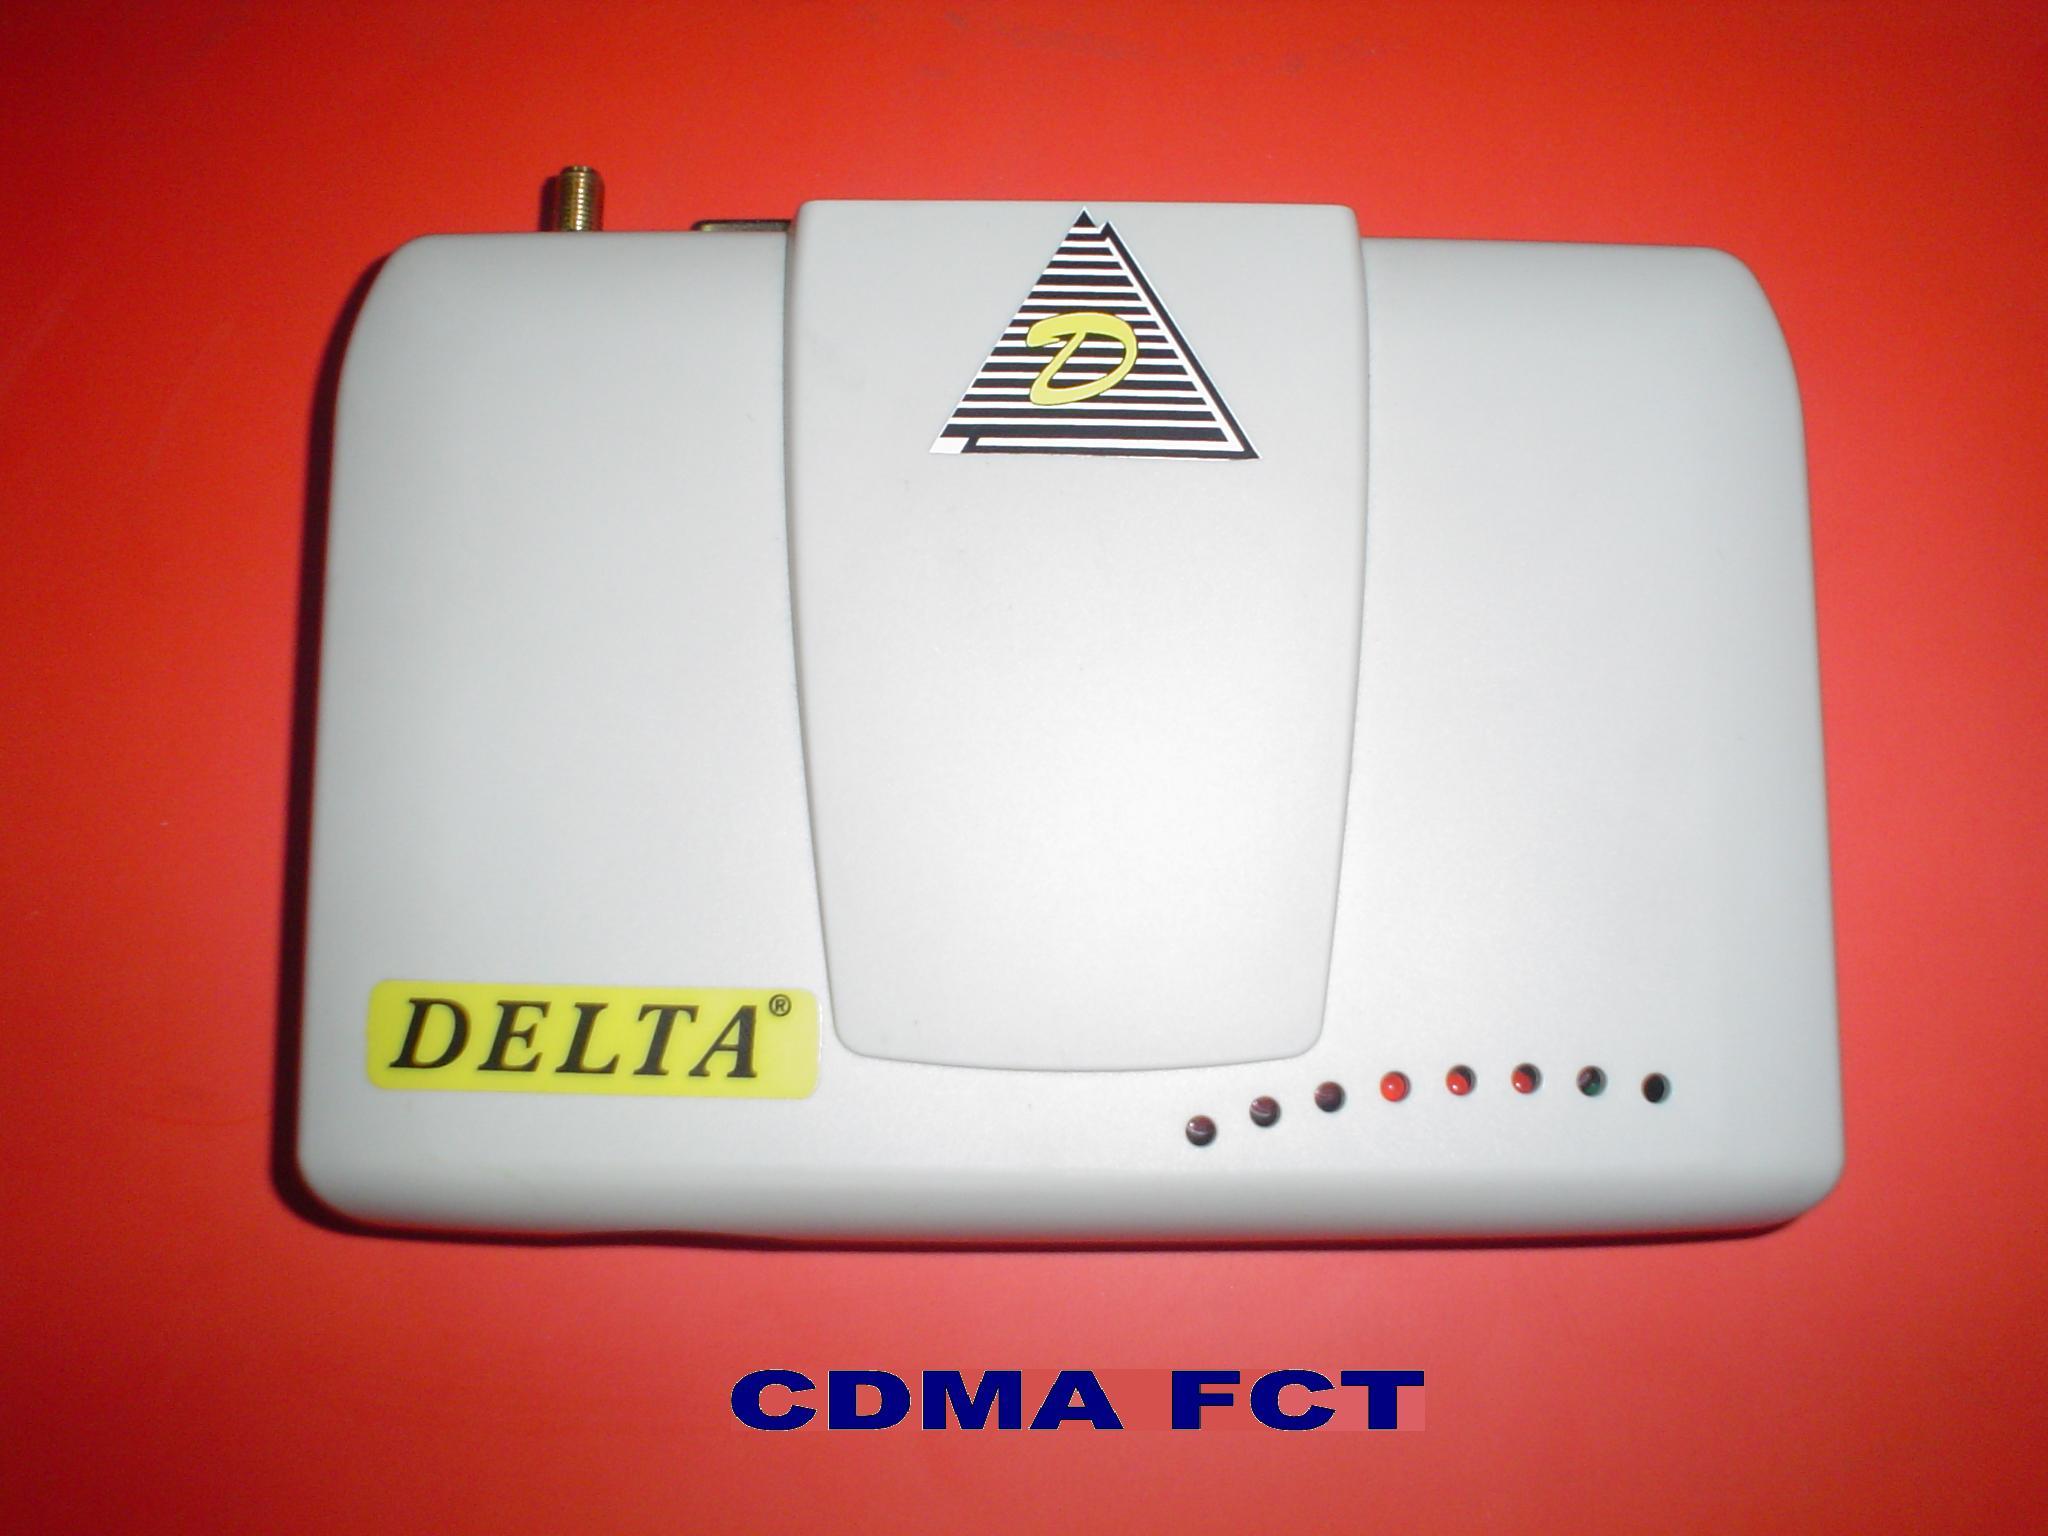 CDMA FCT